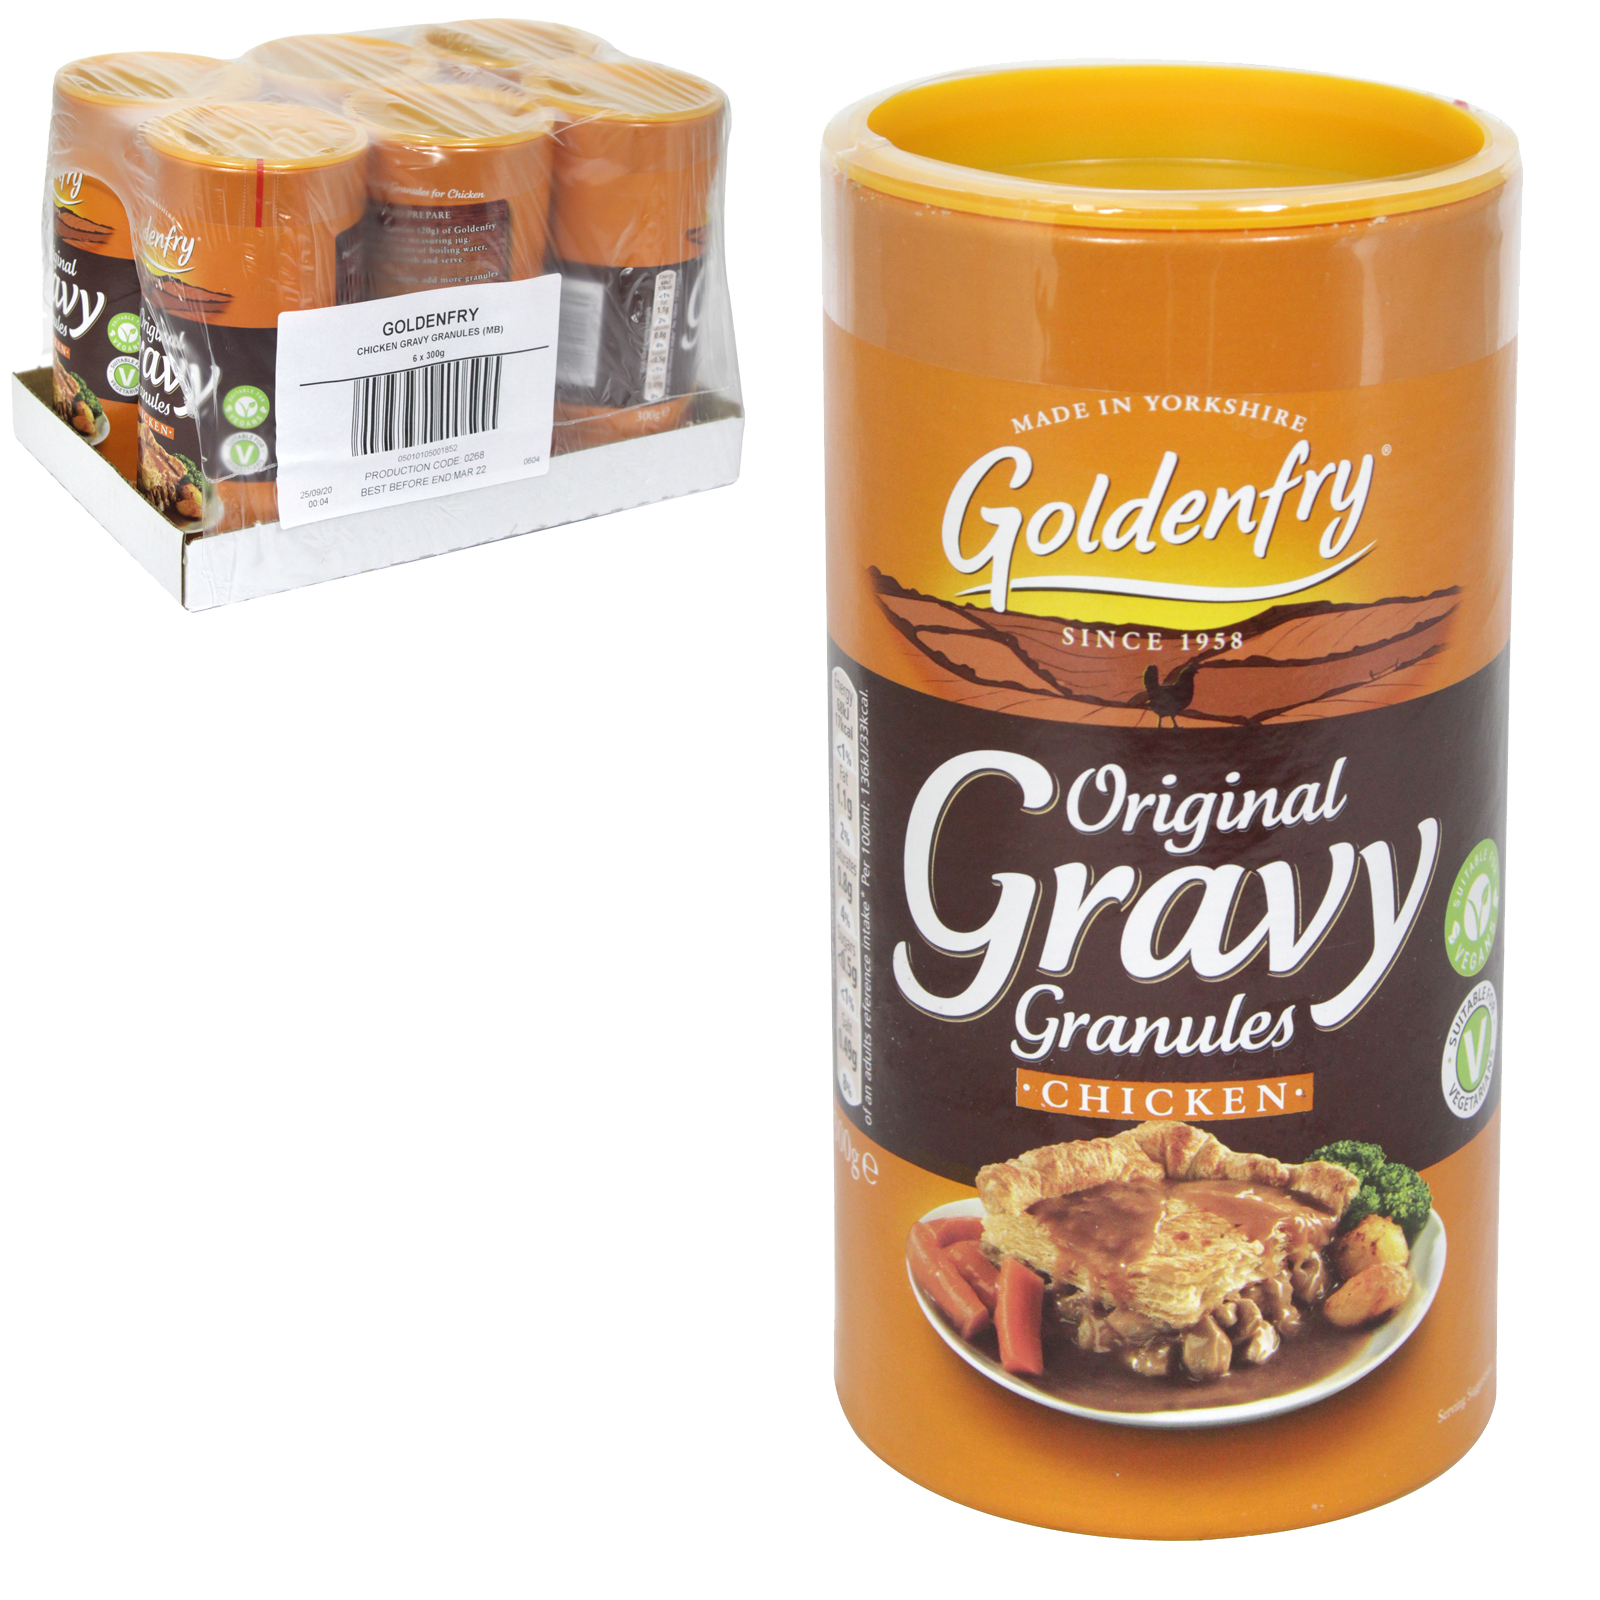 GOLDEN FRY CHICKEN GRAVY GRANULES PM ?1.49 X6